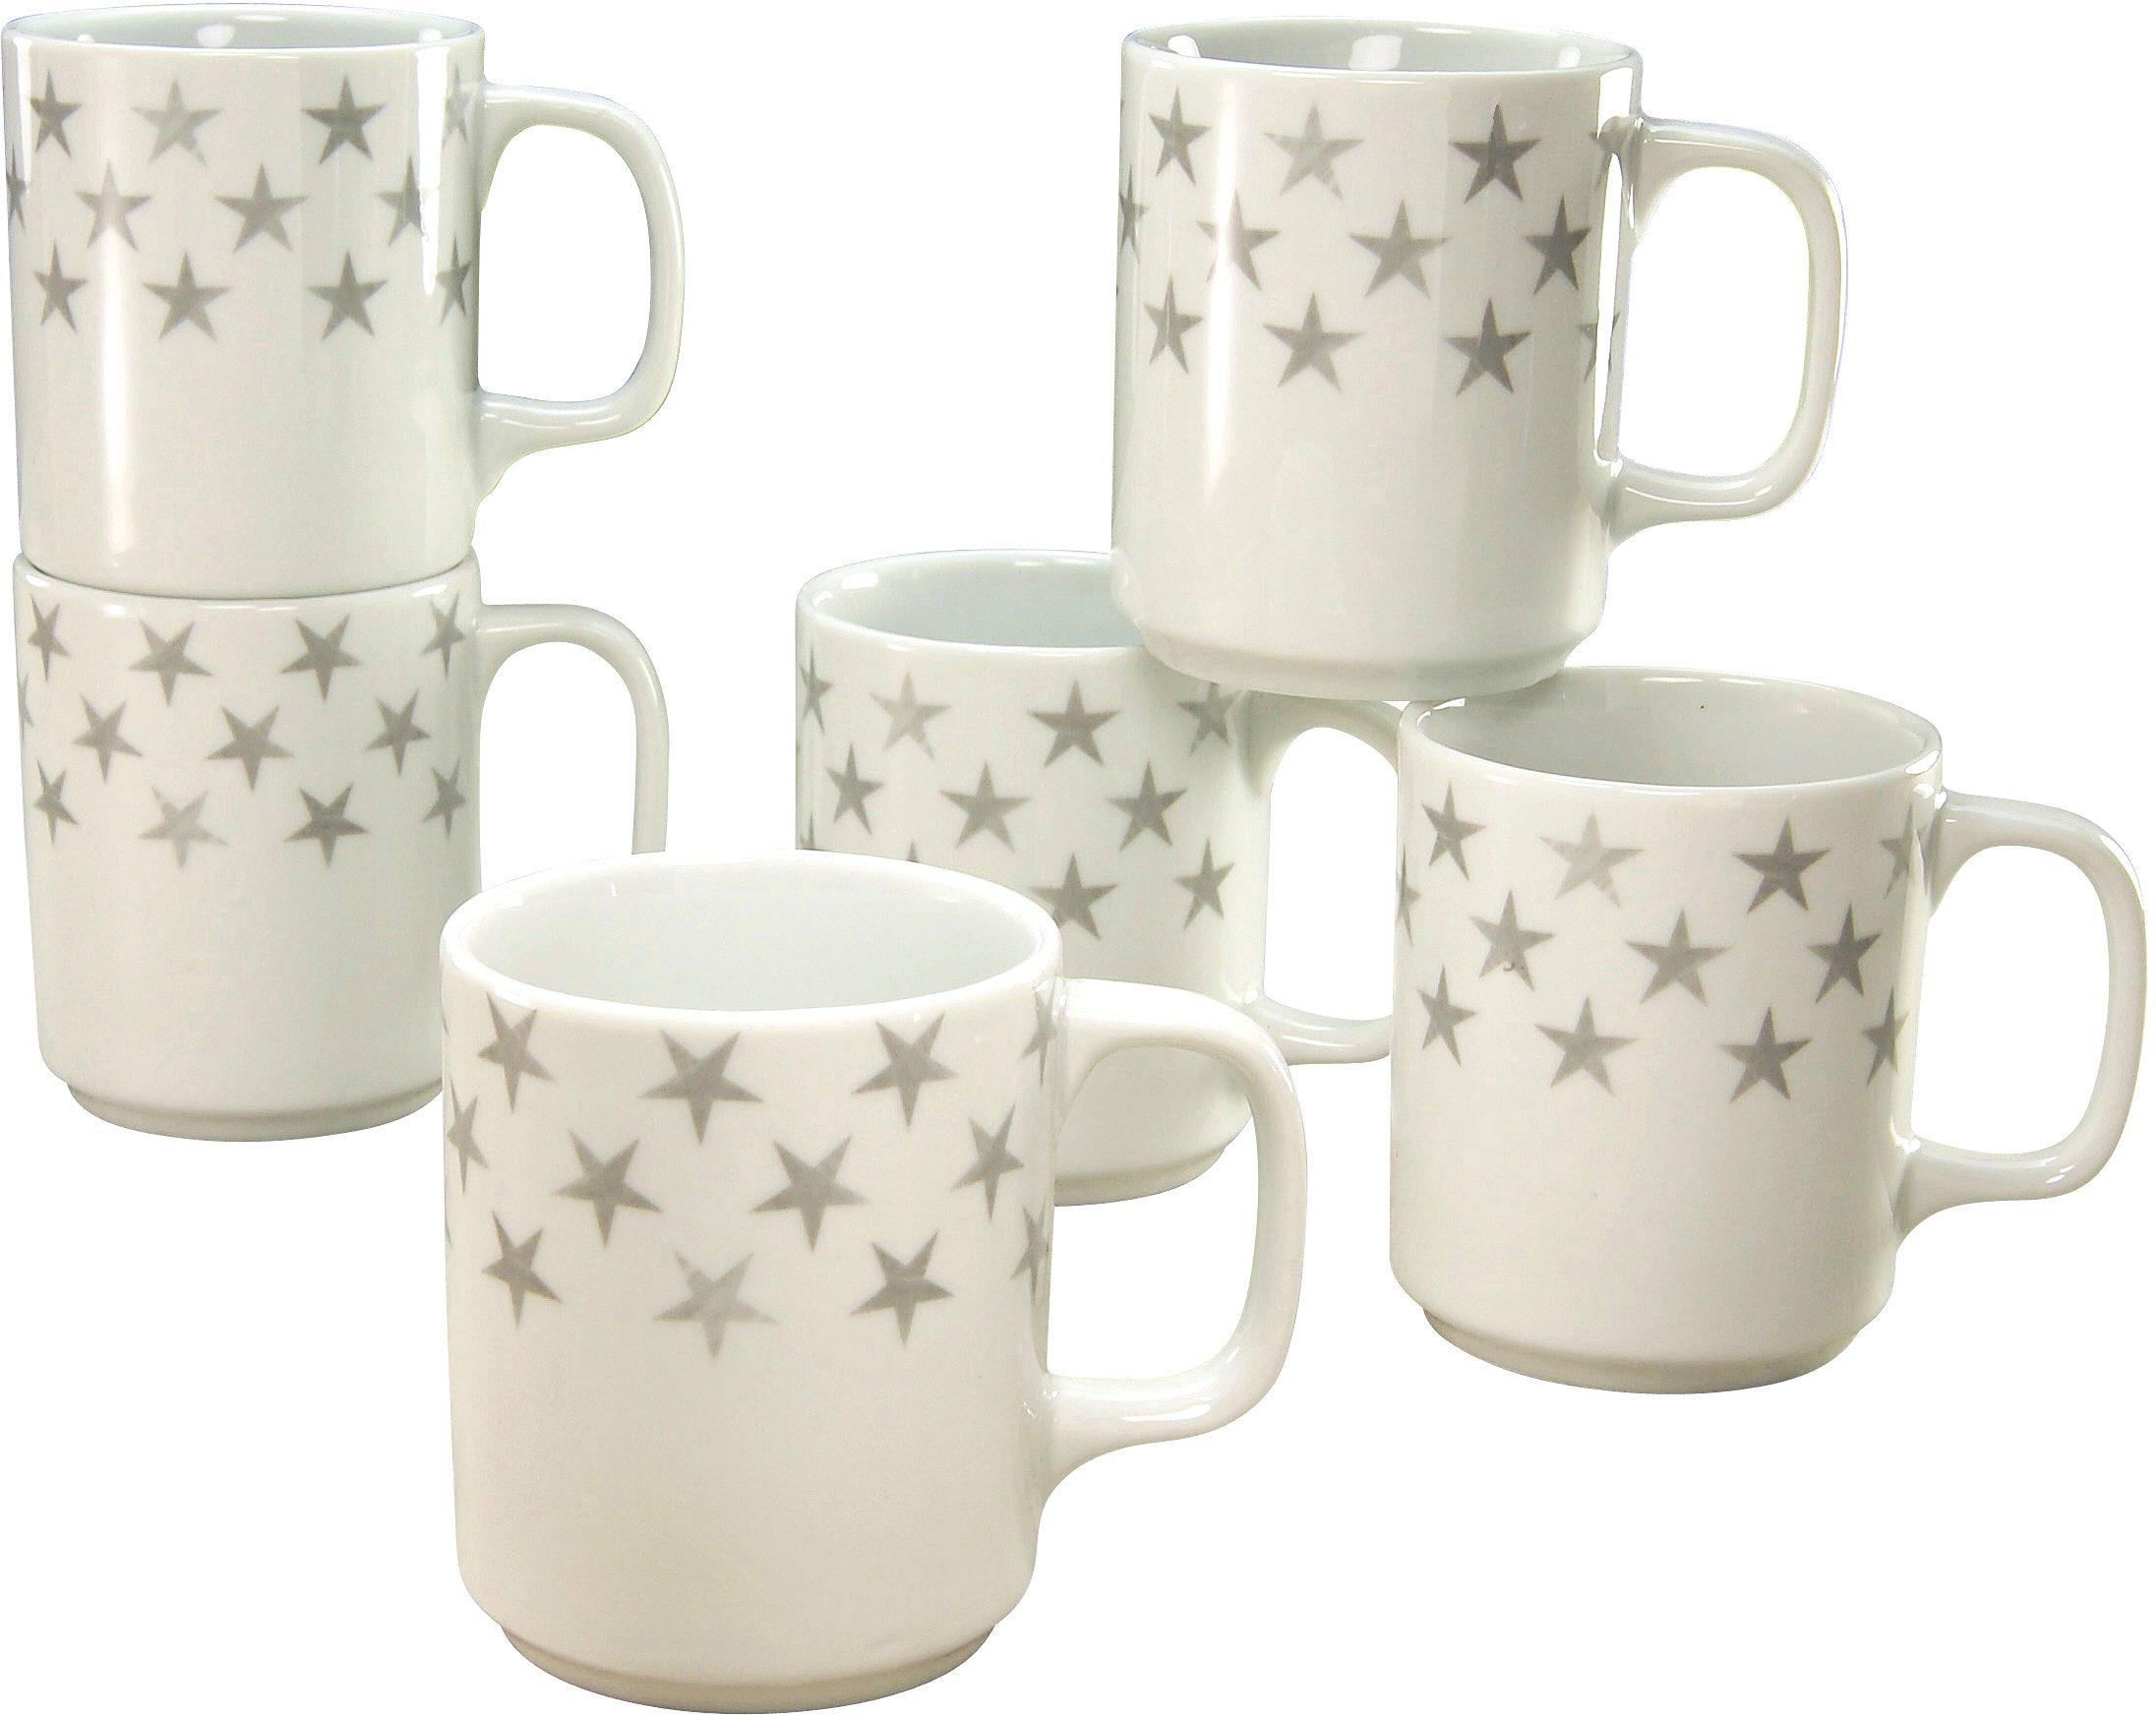 CreaTable Kaffeebecher, Porzellan, 6 Teile, »STERNE«